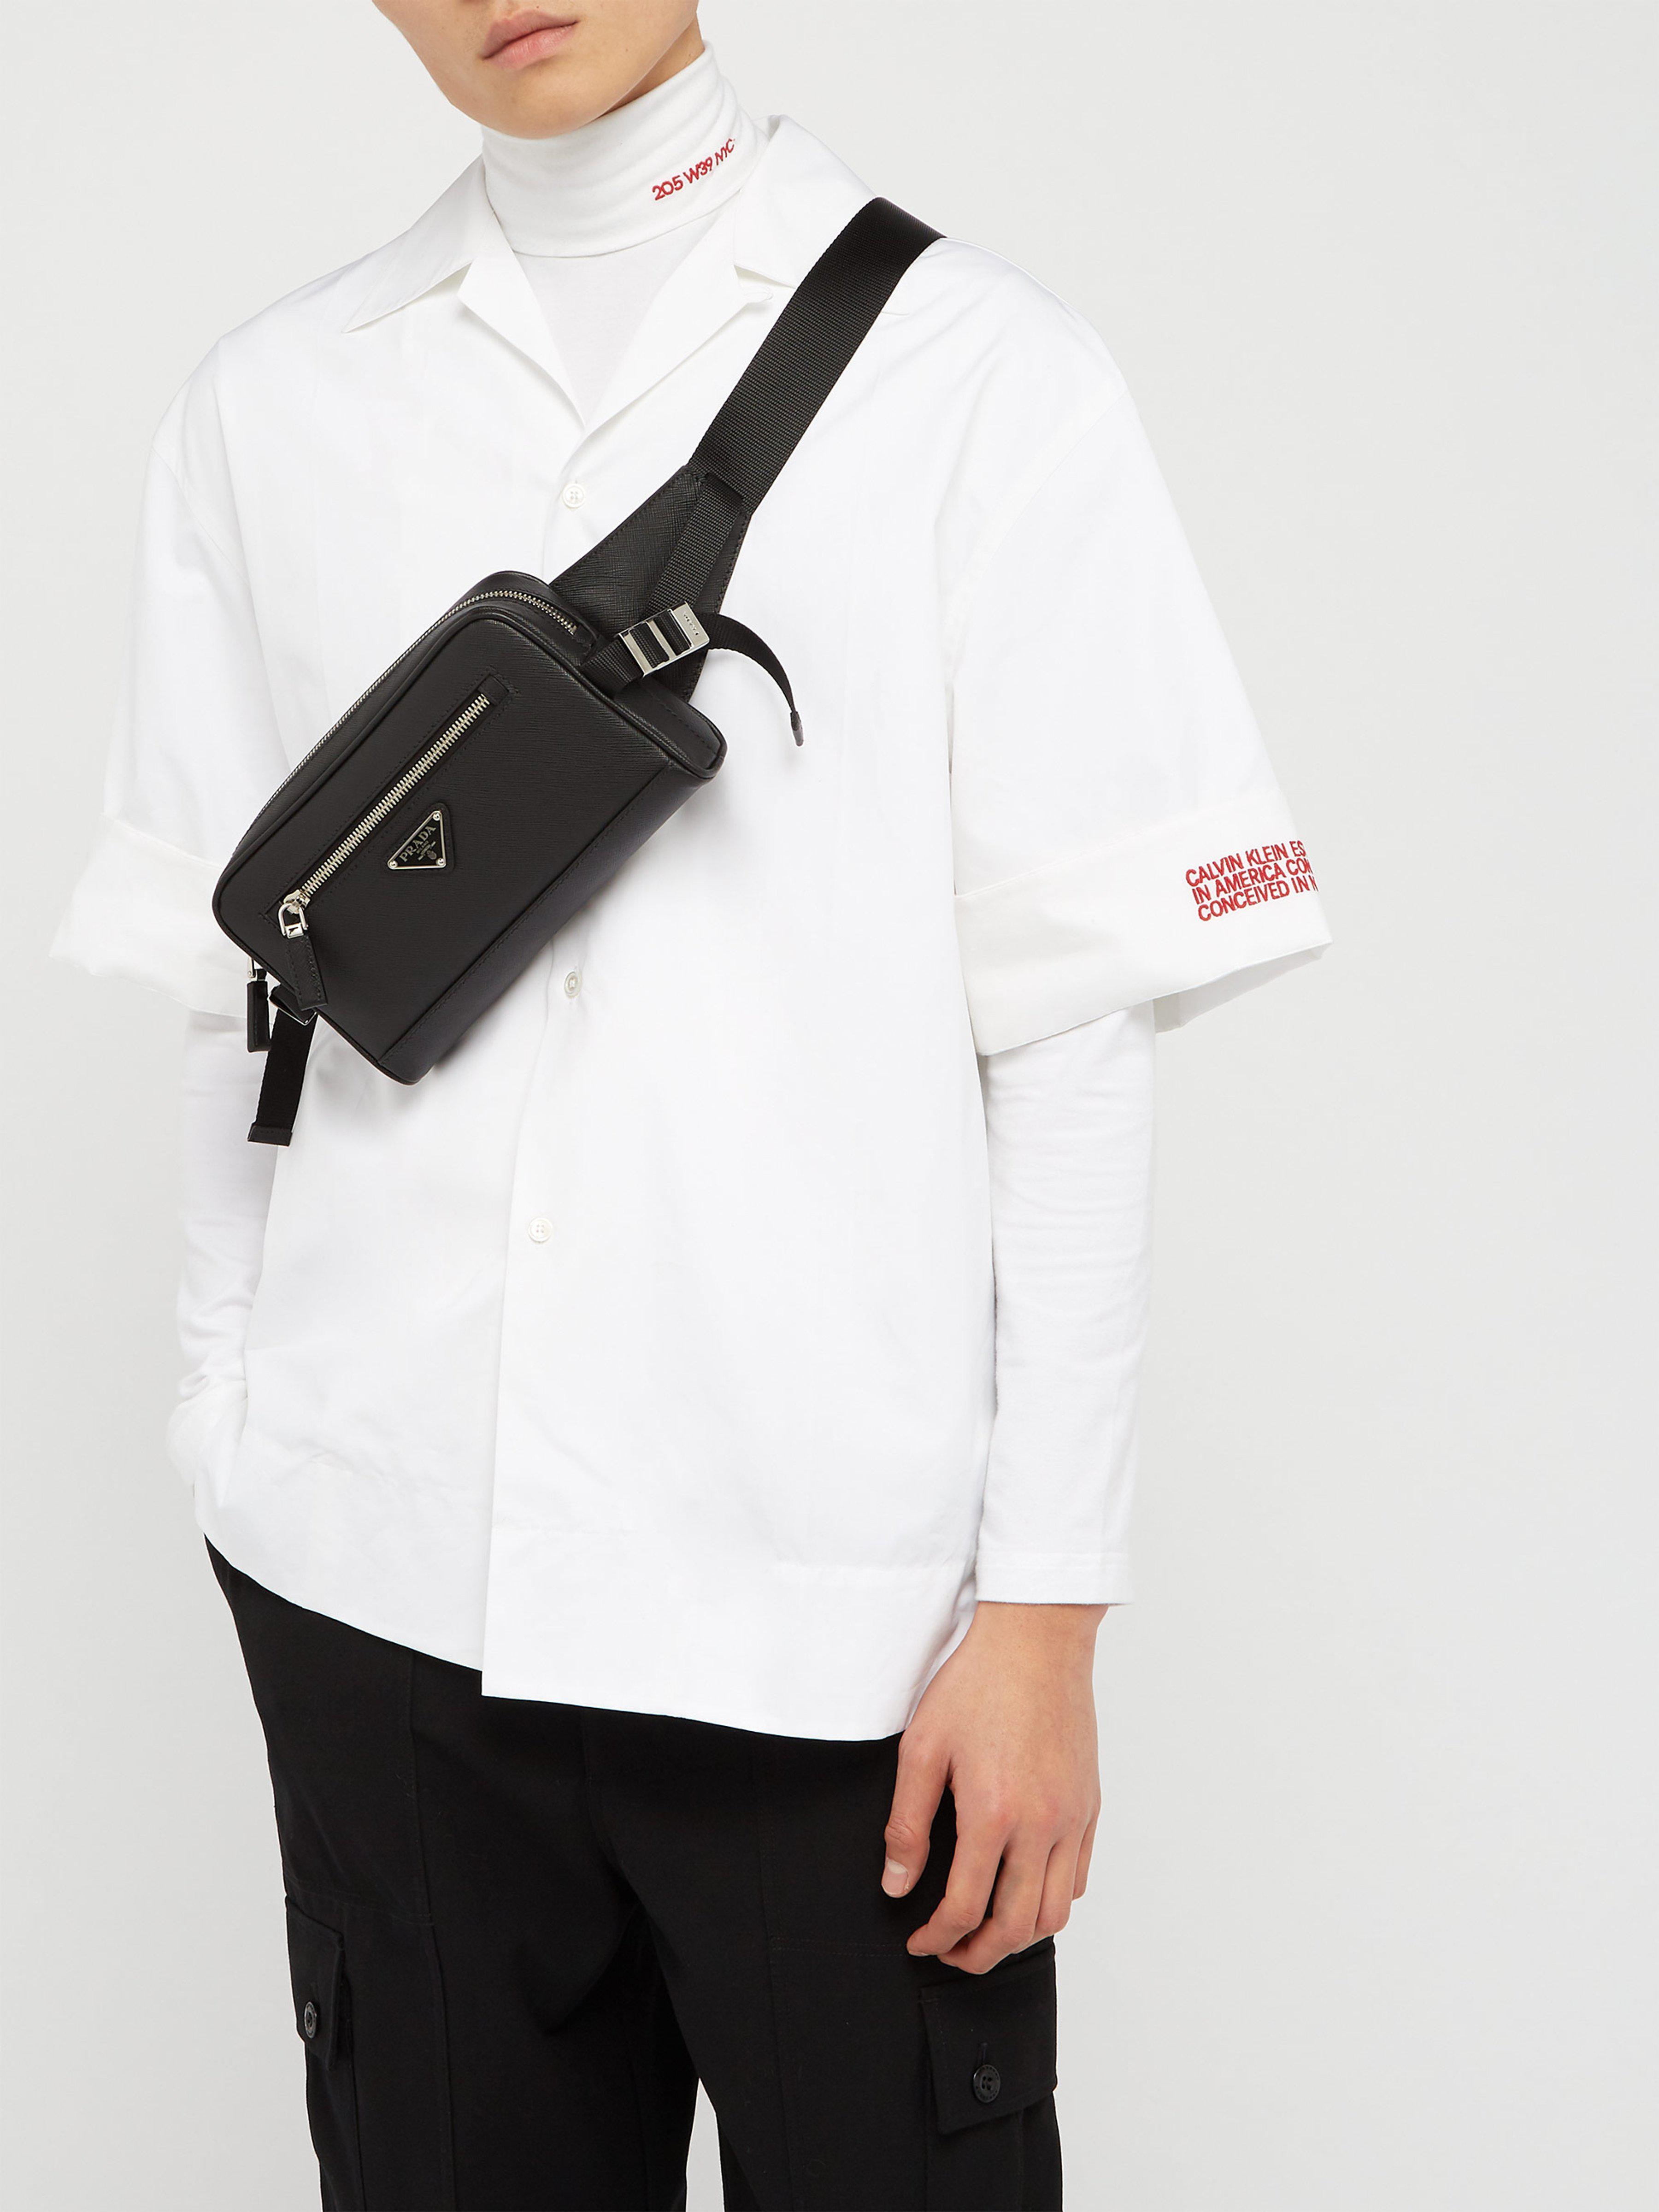 6d32404e42 Prada Saffiano Leather Belt Bag in Black for Men - Lyst